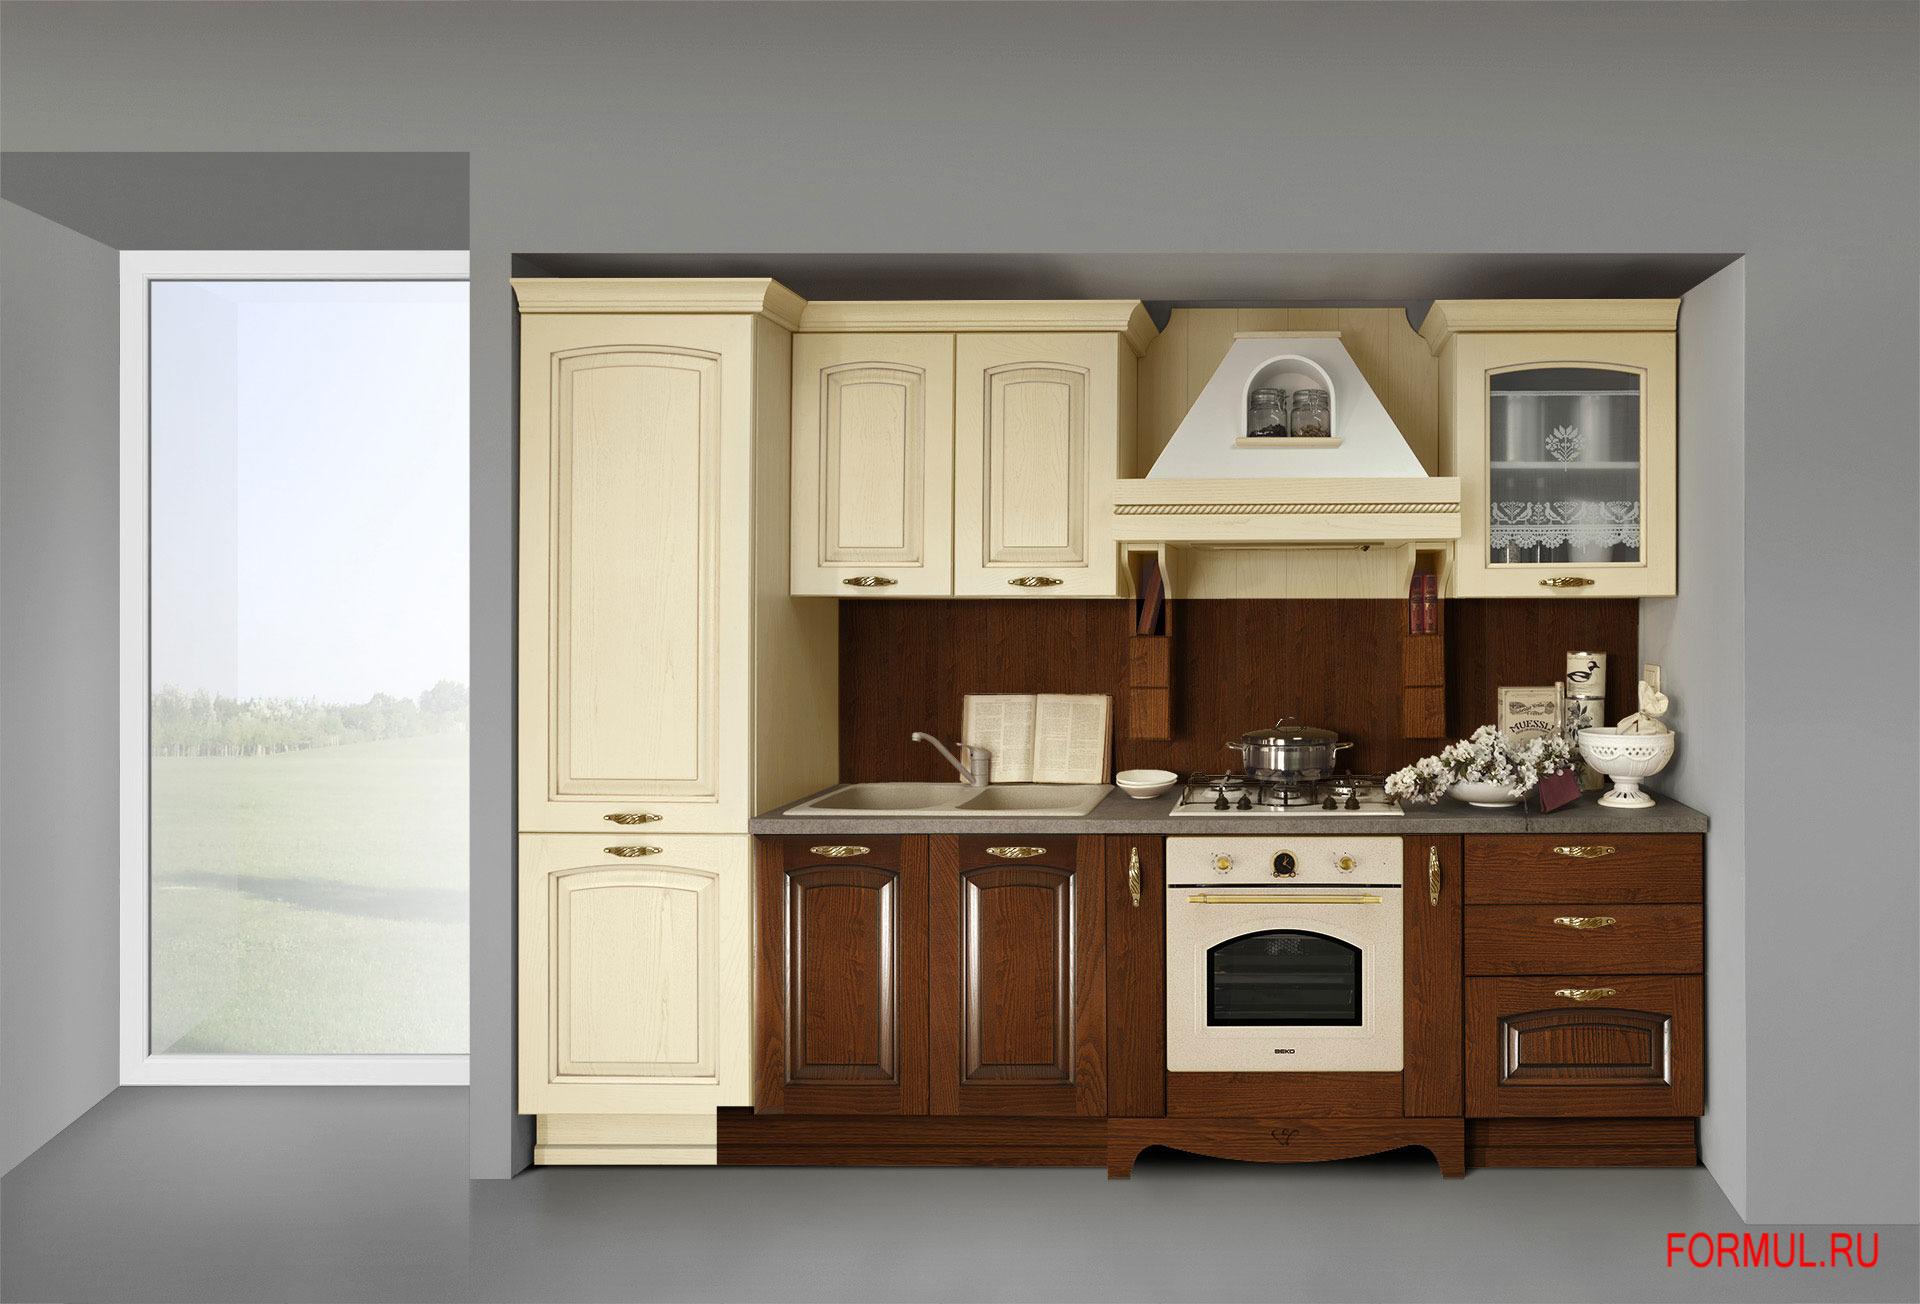 Cucine Aerre. Ar Tre Cucine Classiche New Aerre Cucine Cucina Ar Tre ...